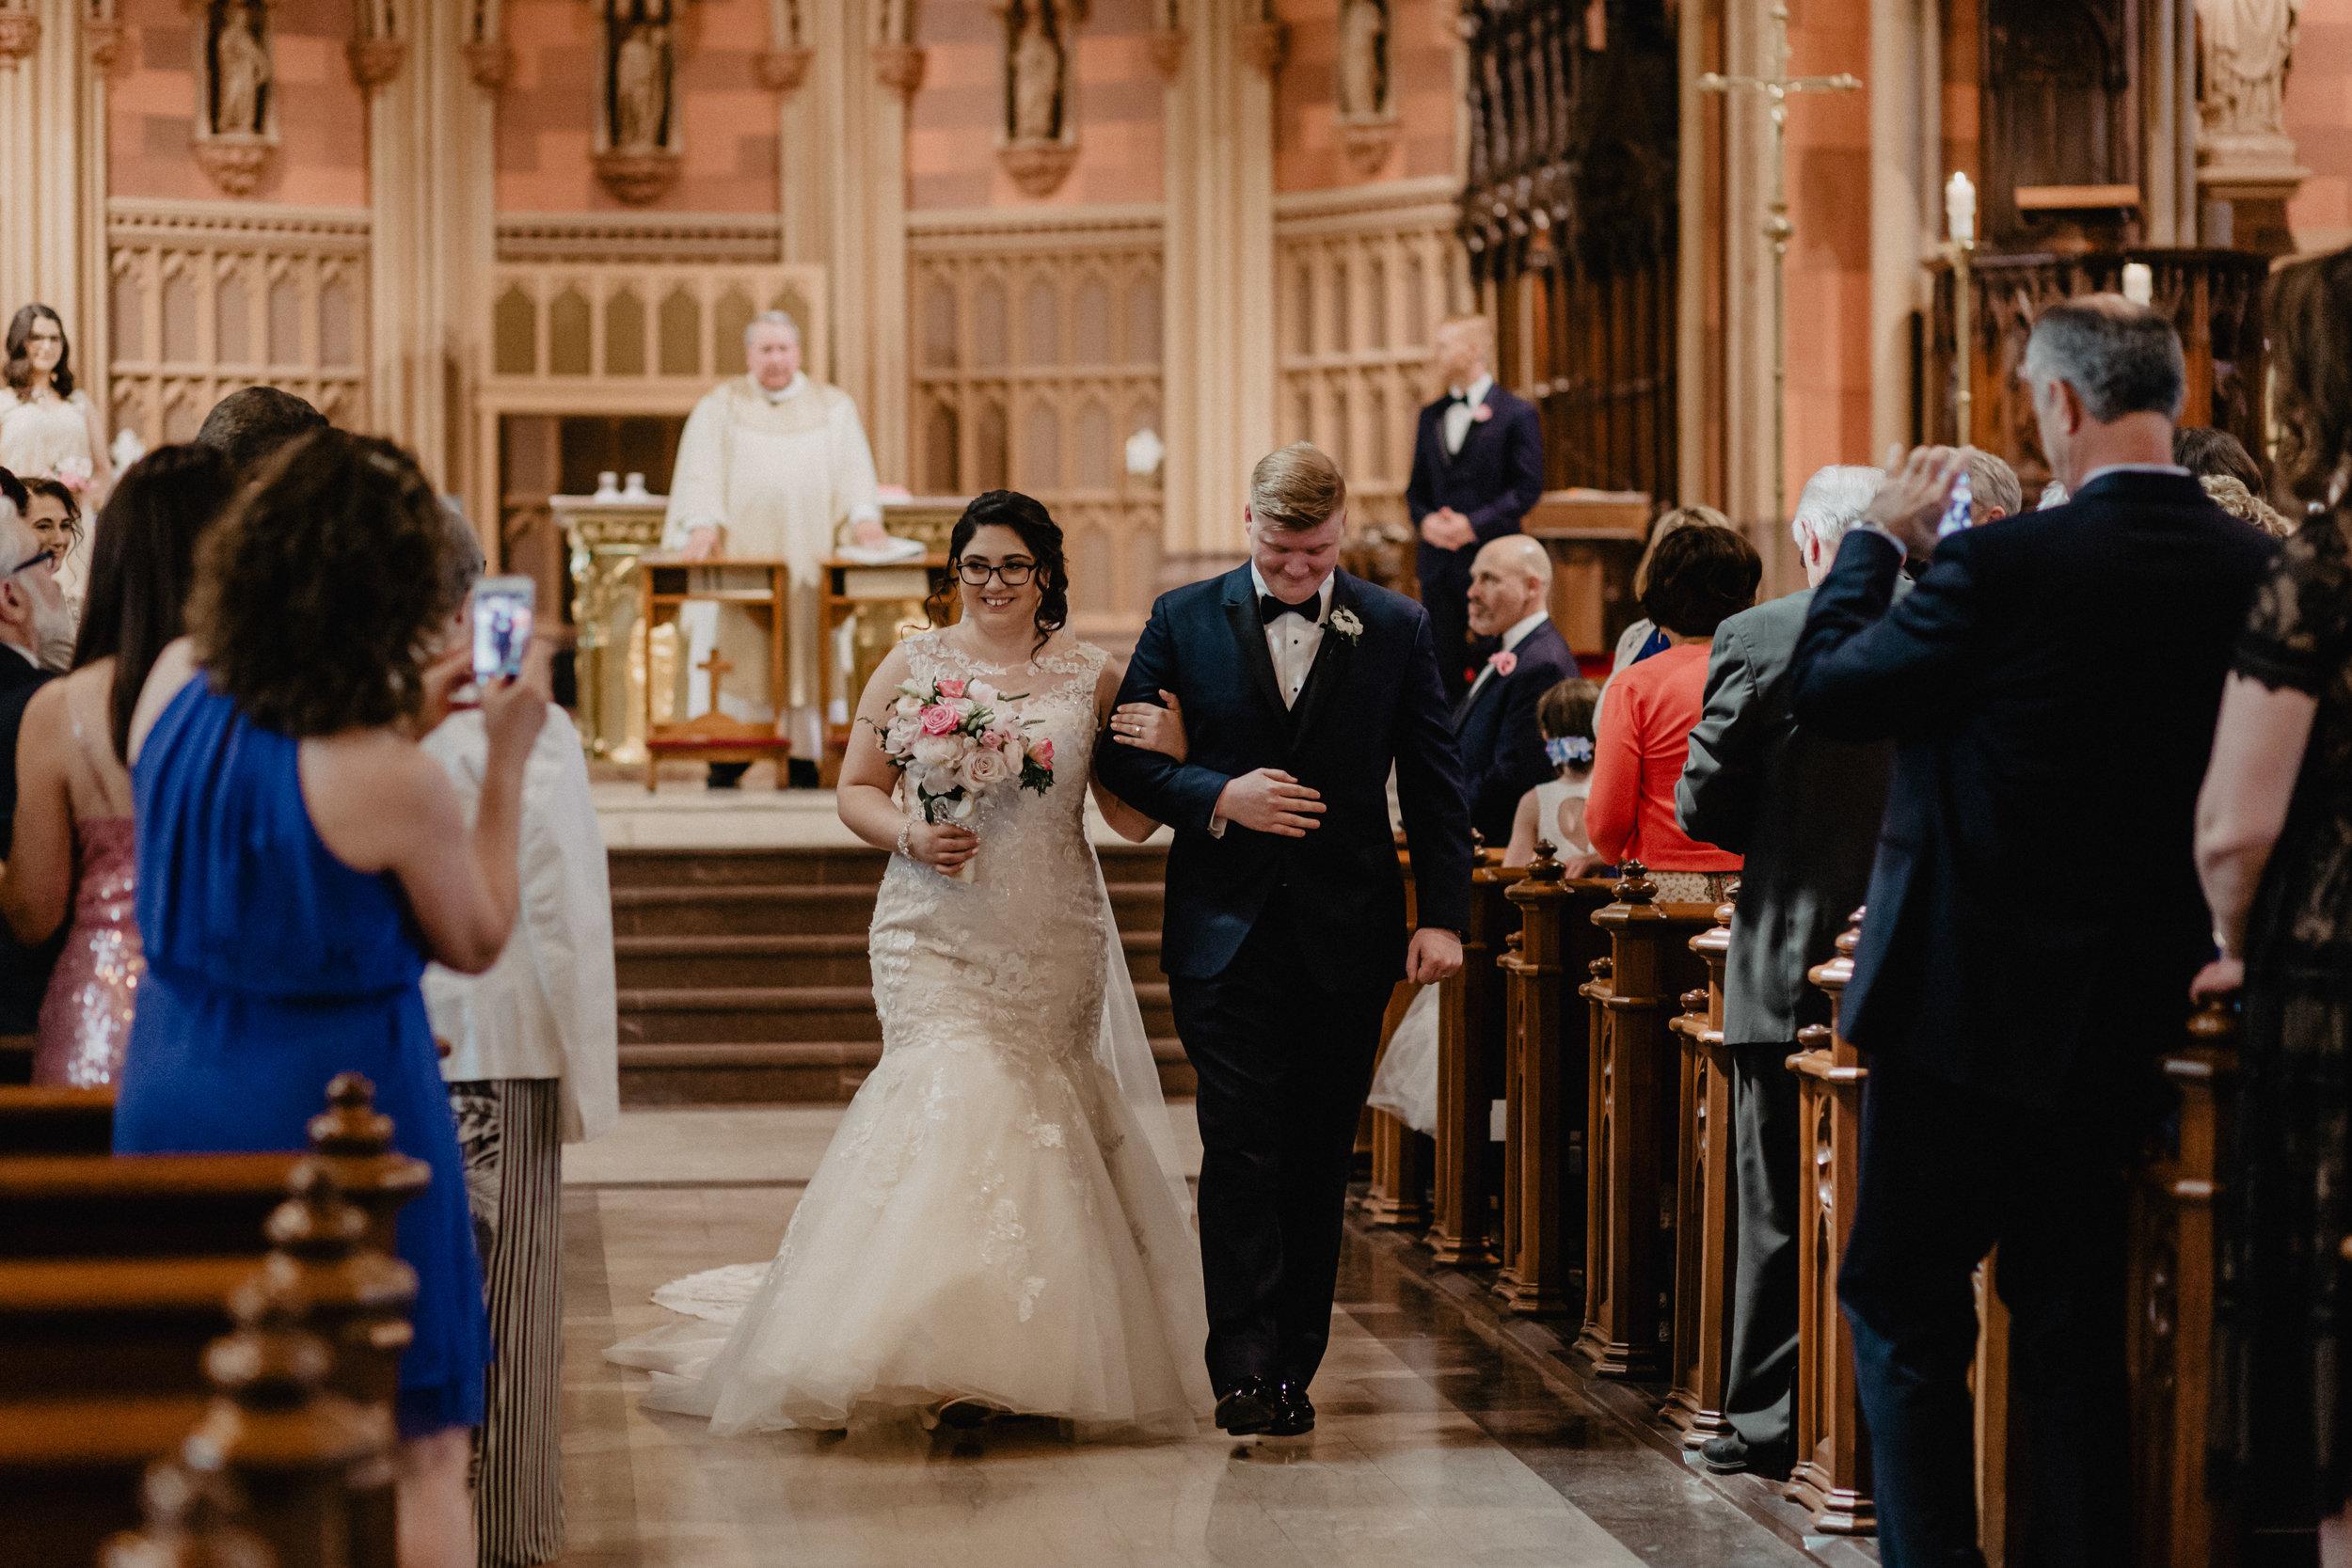 albany-new-york-wedding-25.jpg